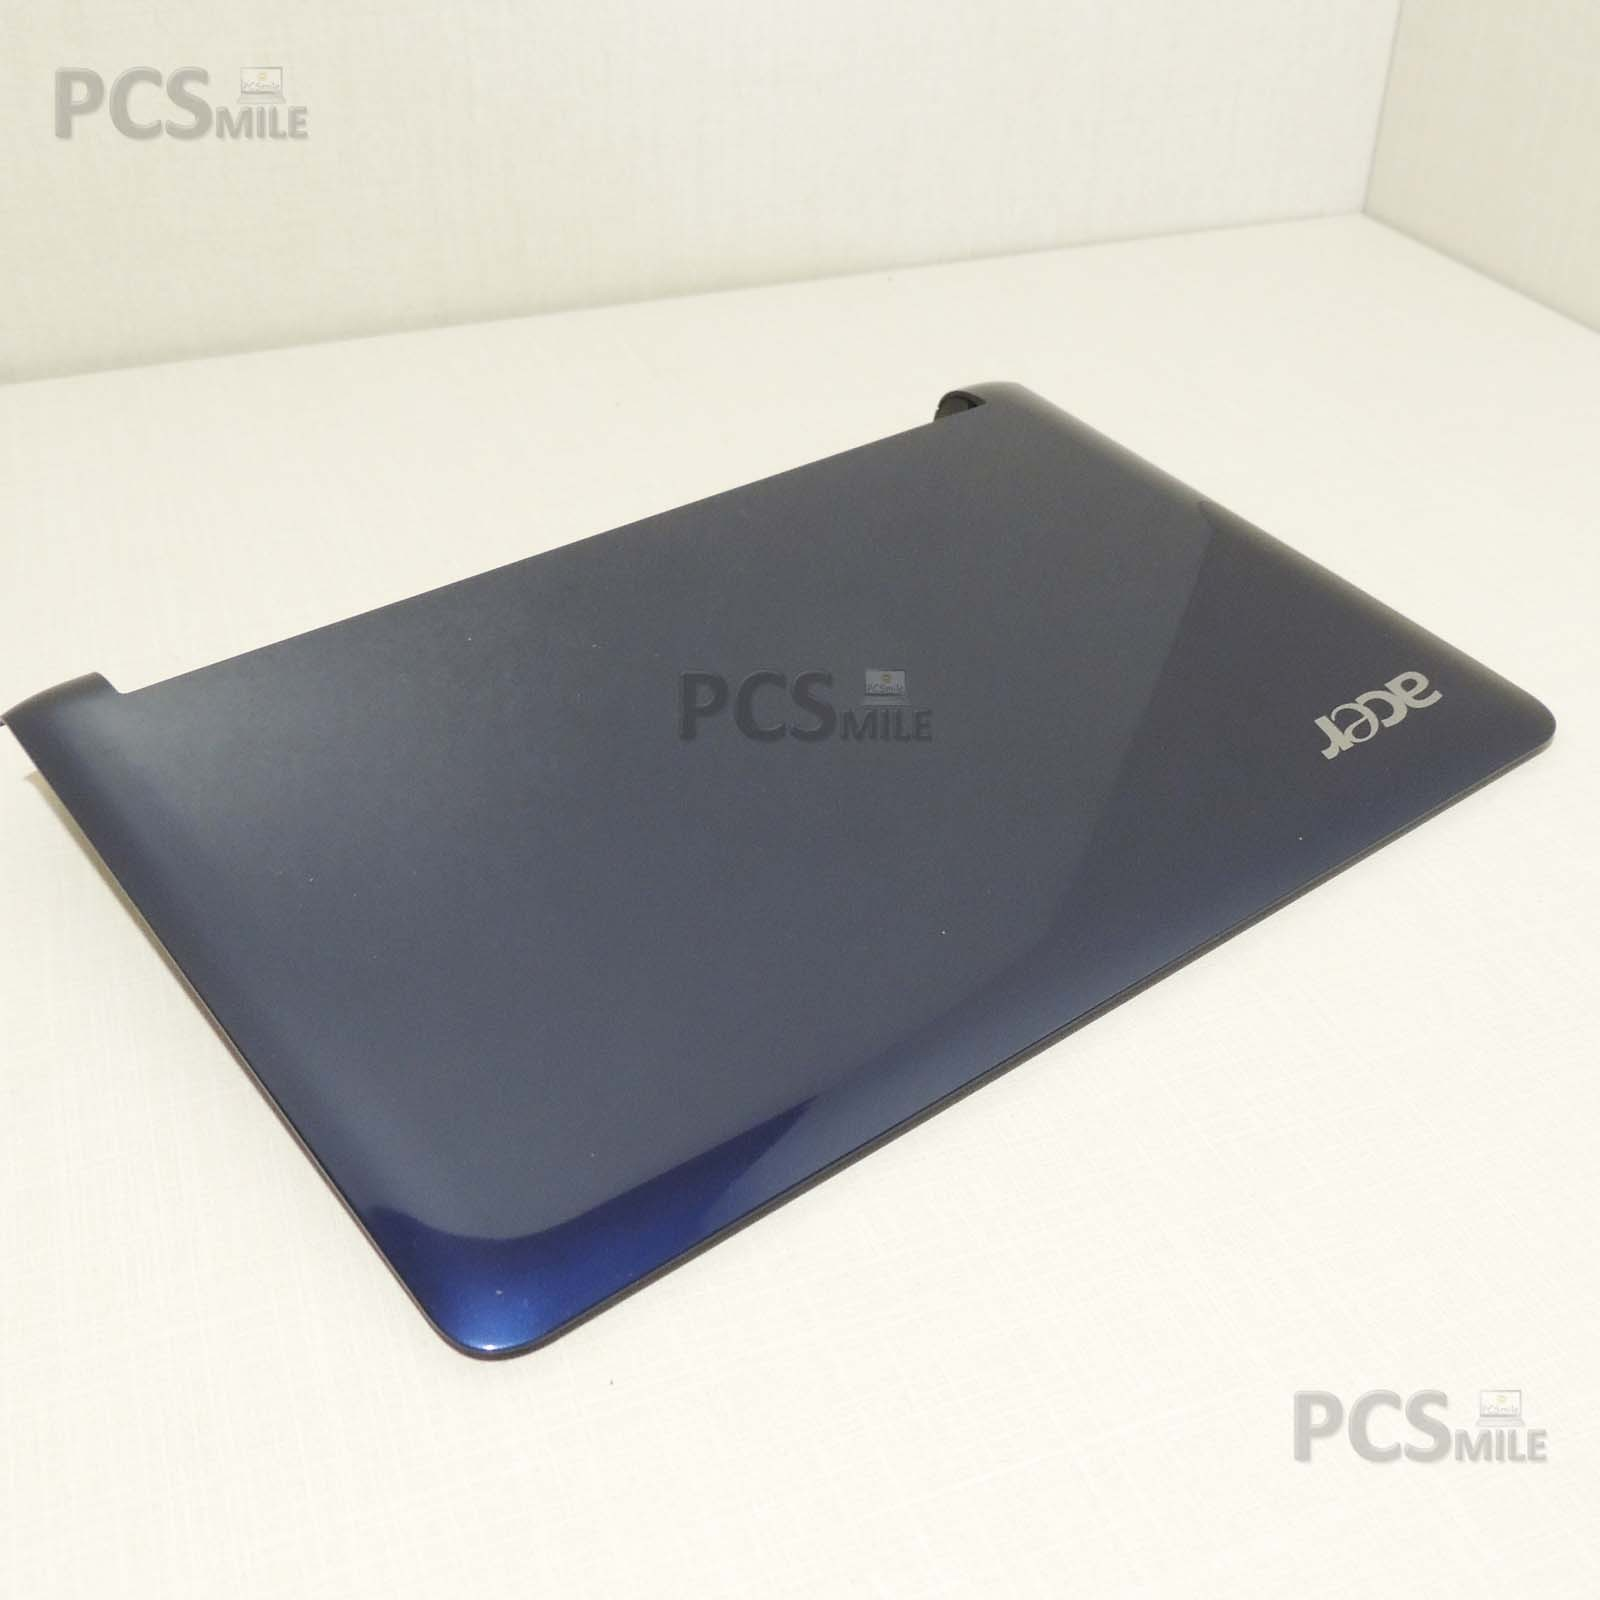 Scocca LCD Acer Aspire one ZG5 Series Cover display ZYE REV:3A EAZG5001030 BLU